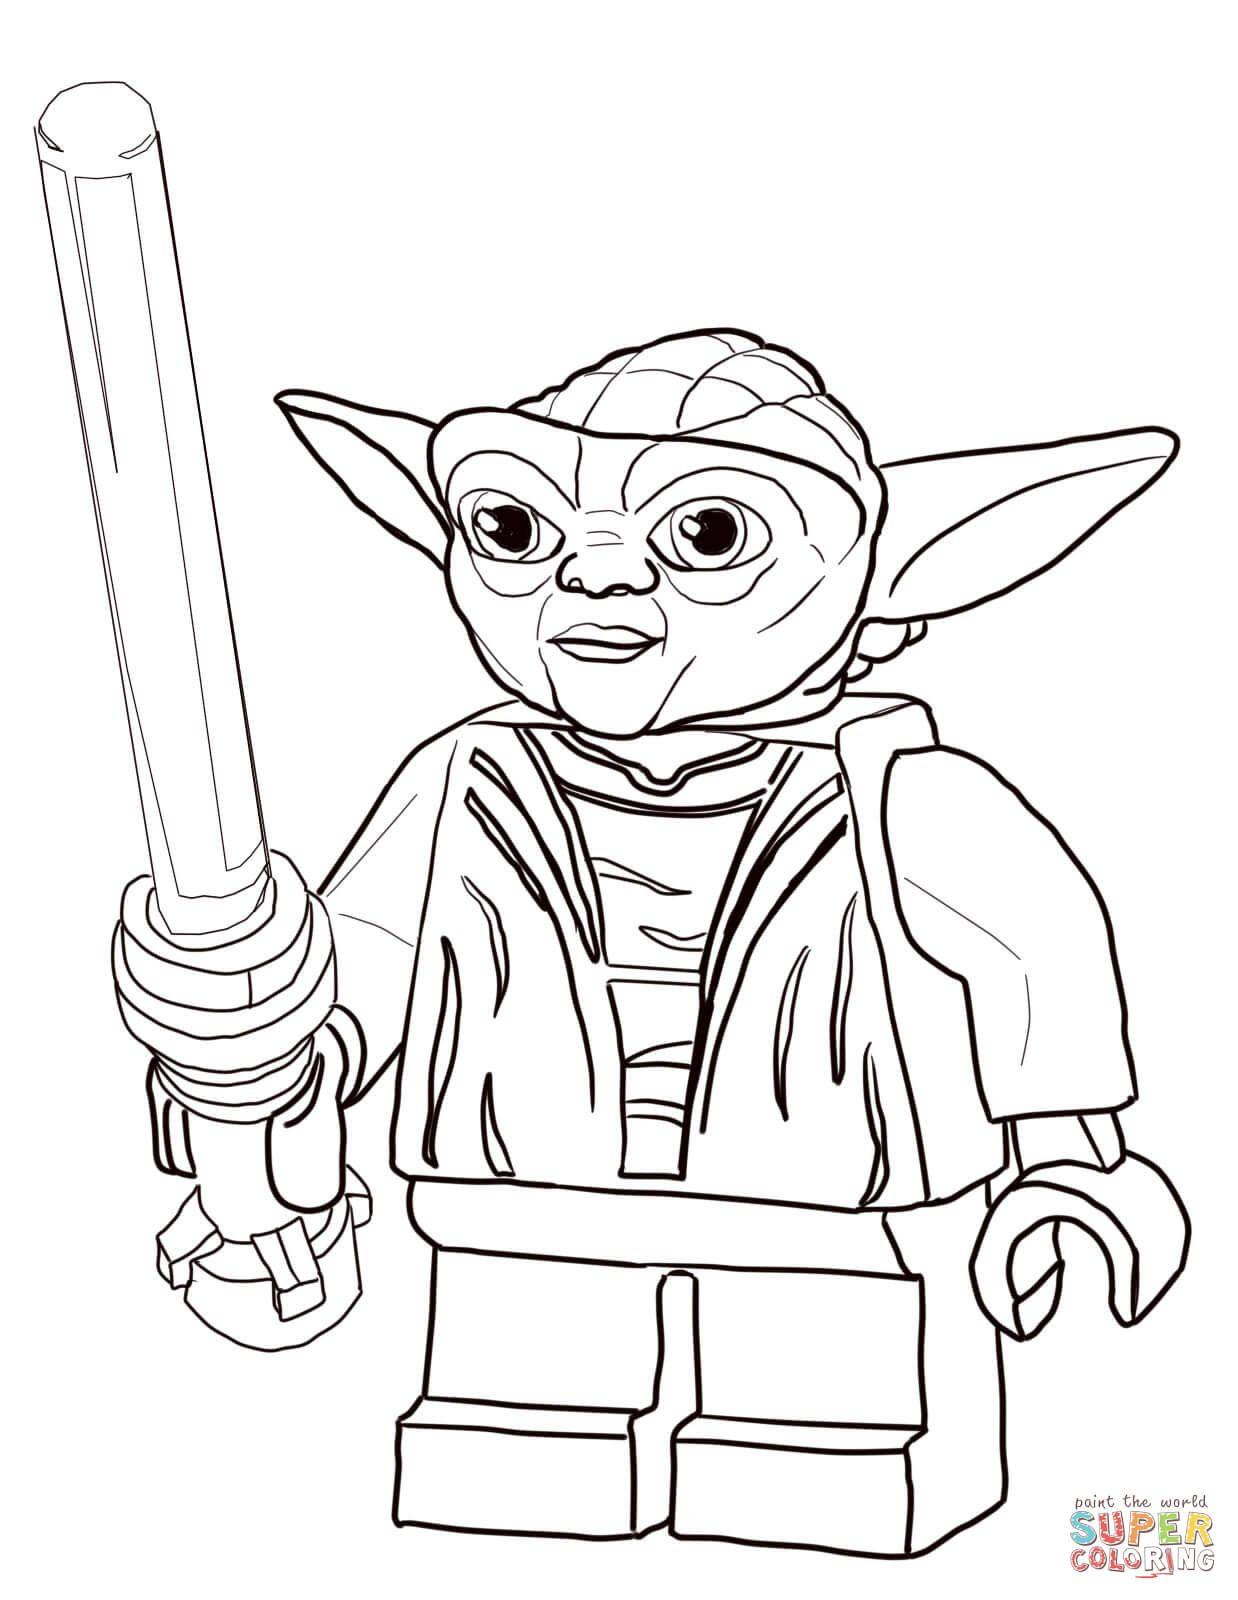 1238x1600 Lego Star Wars Master Yoda Coloring Page Free Printable Colouring